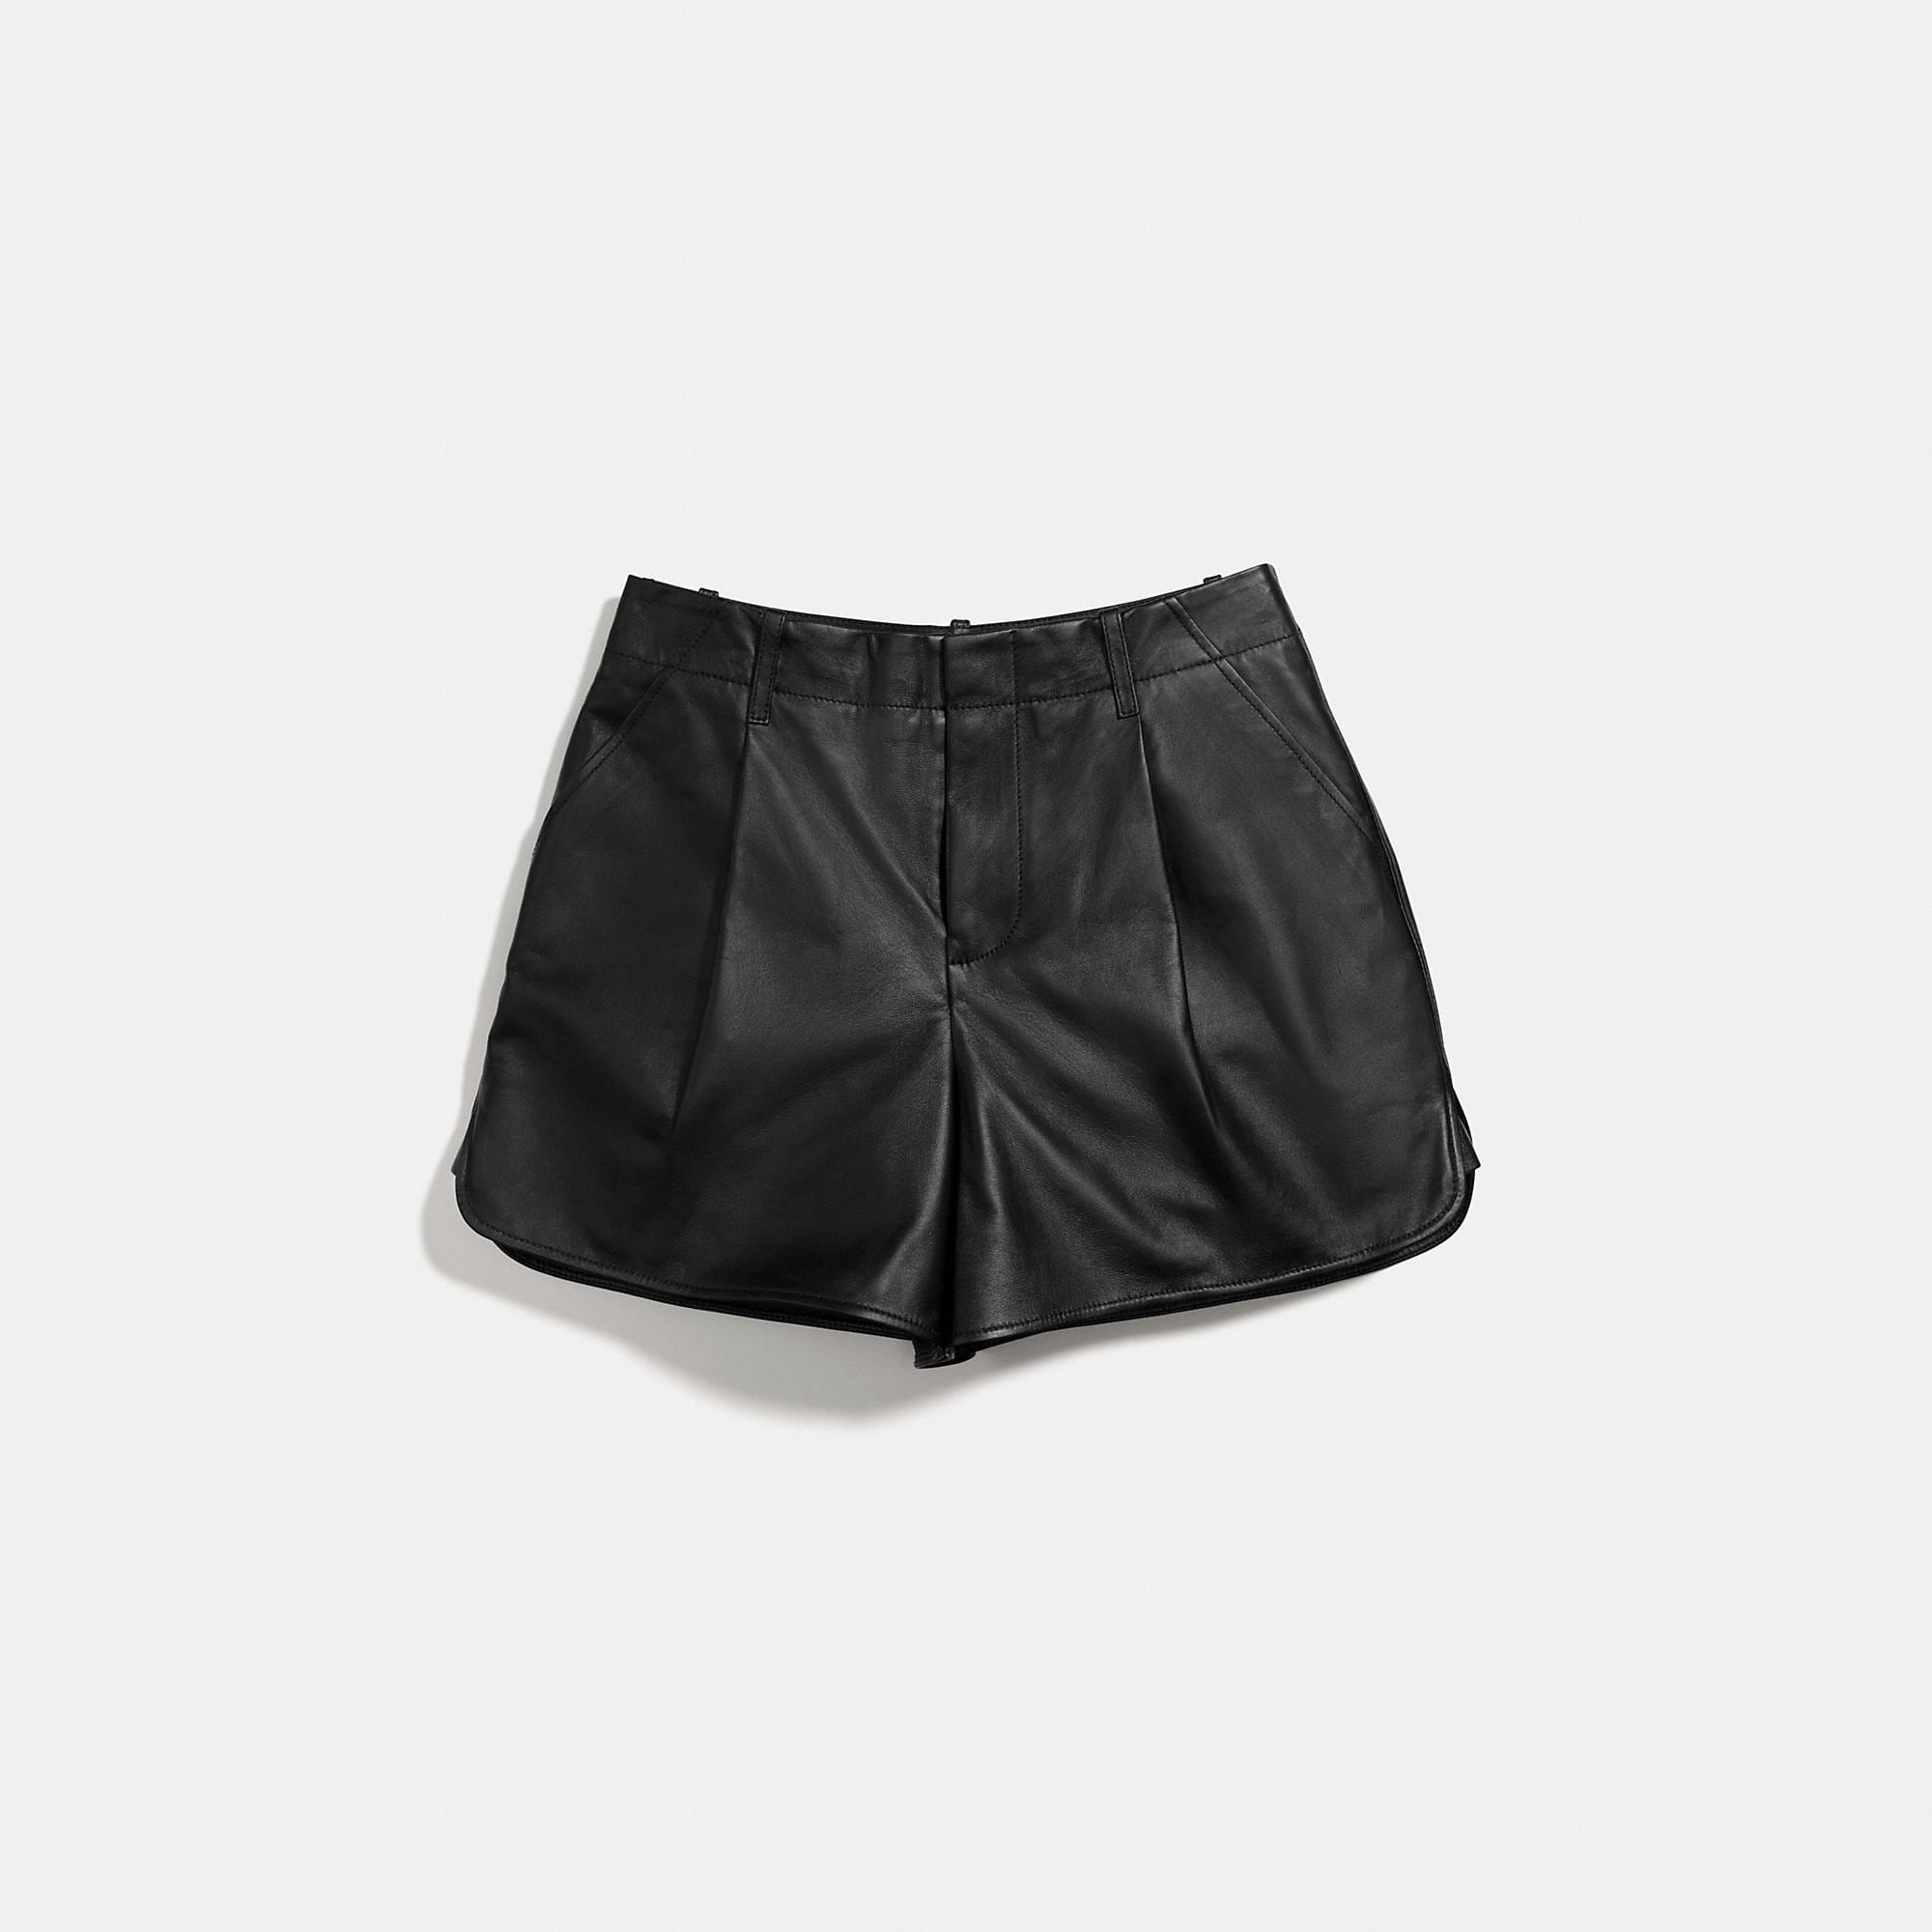 Coach Leather Short